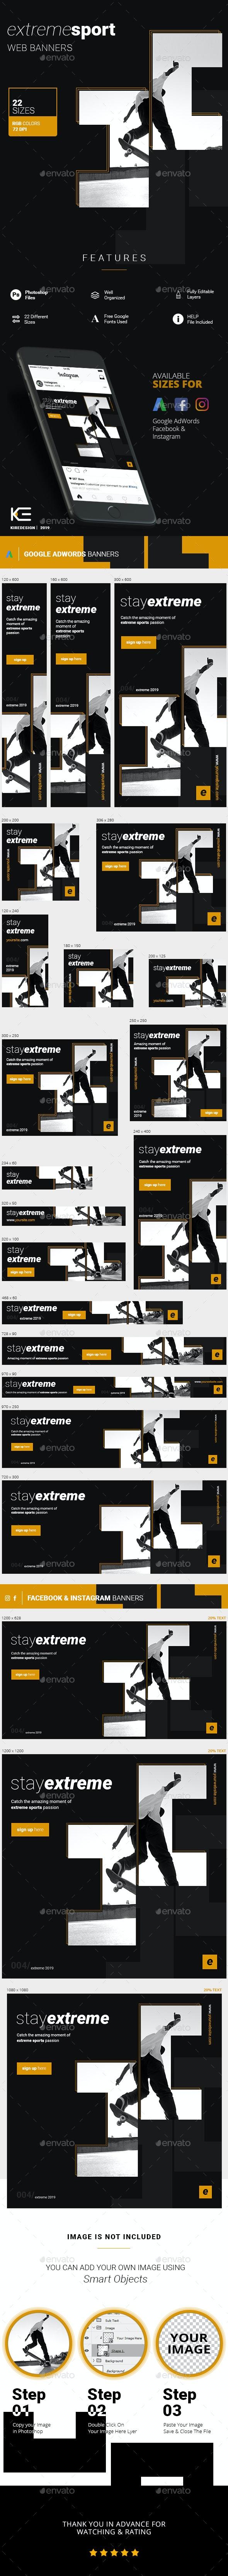 Sport Banners - Social Media Web Elements